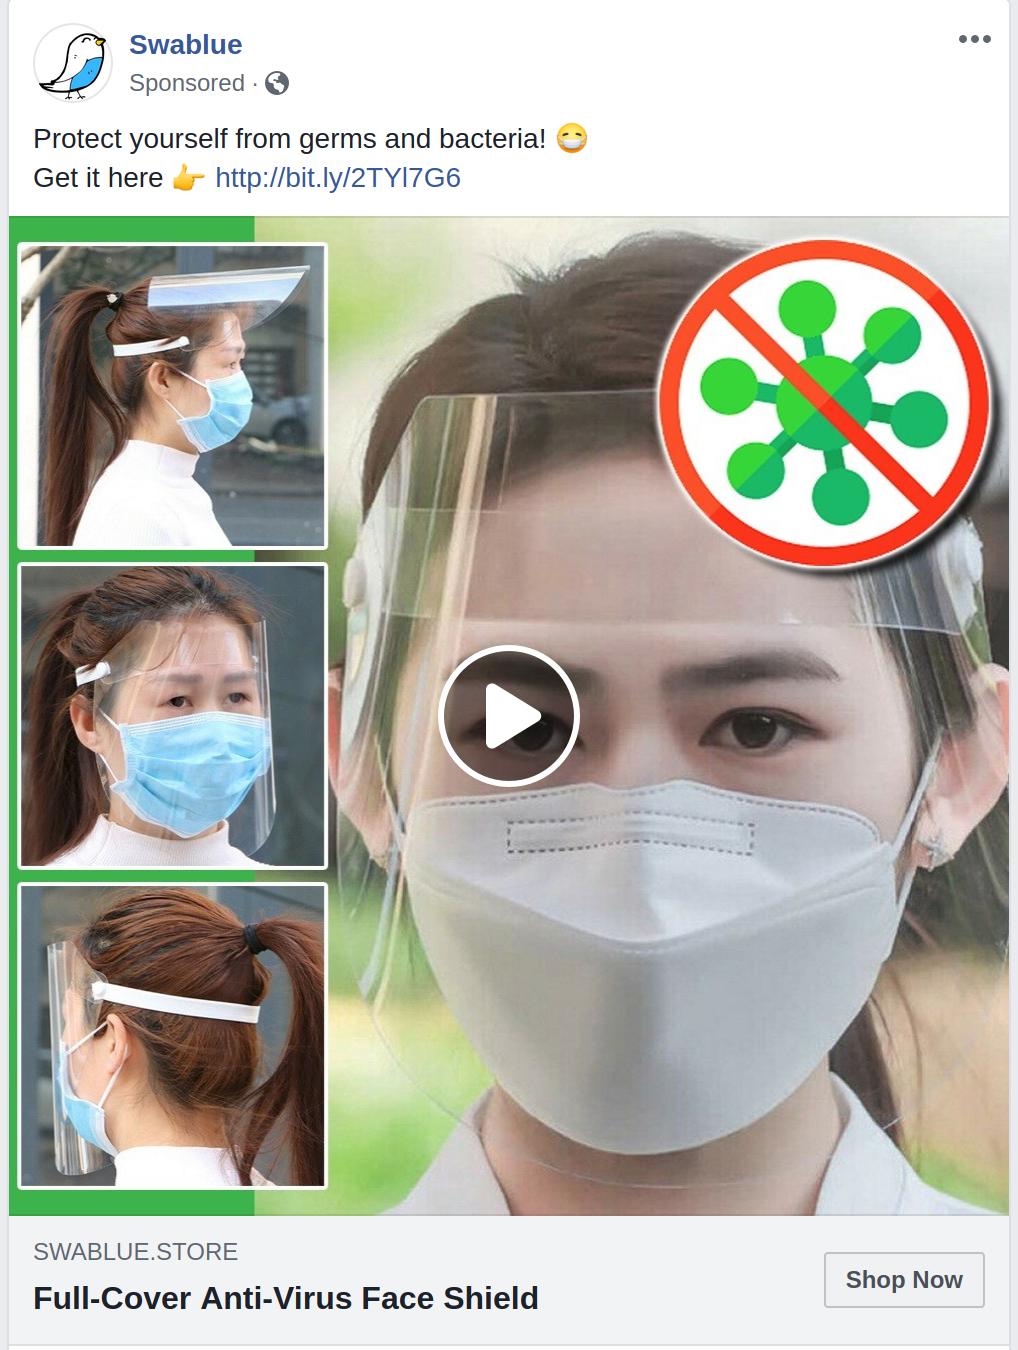 A Facebook ad for a face shield.